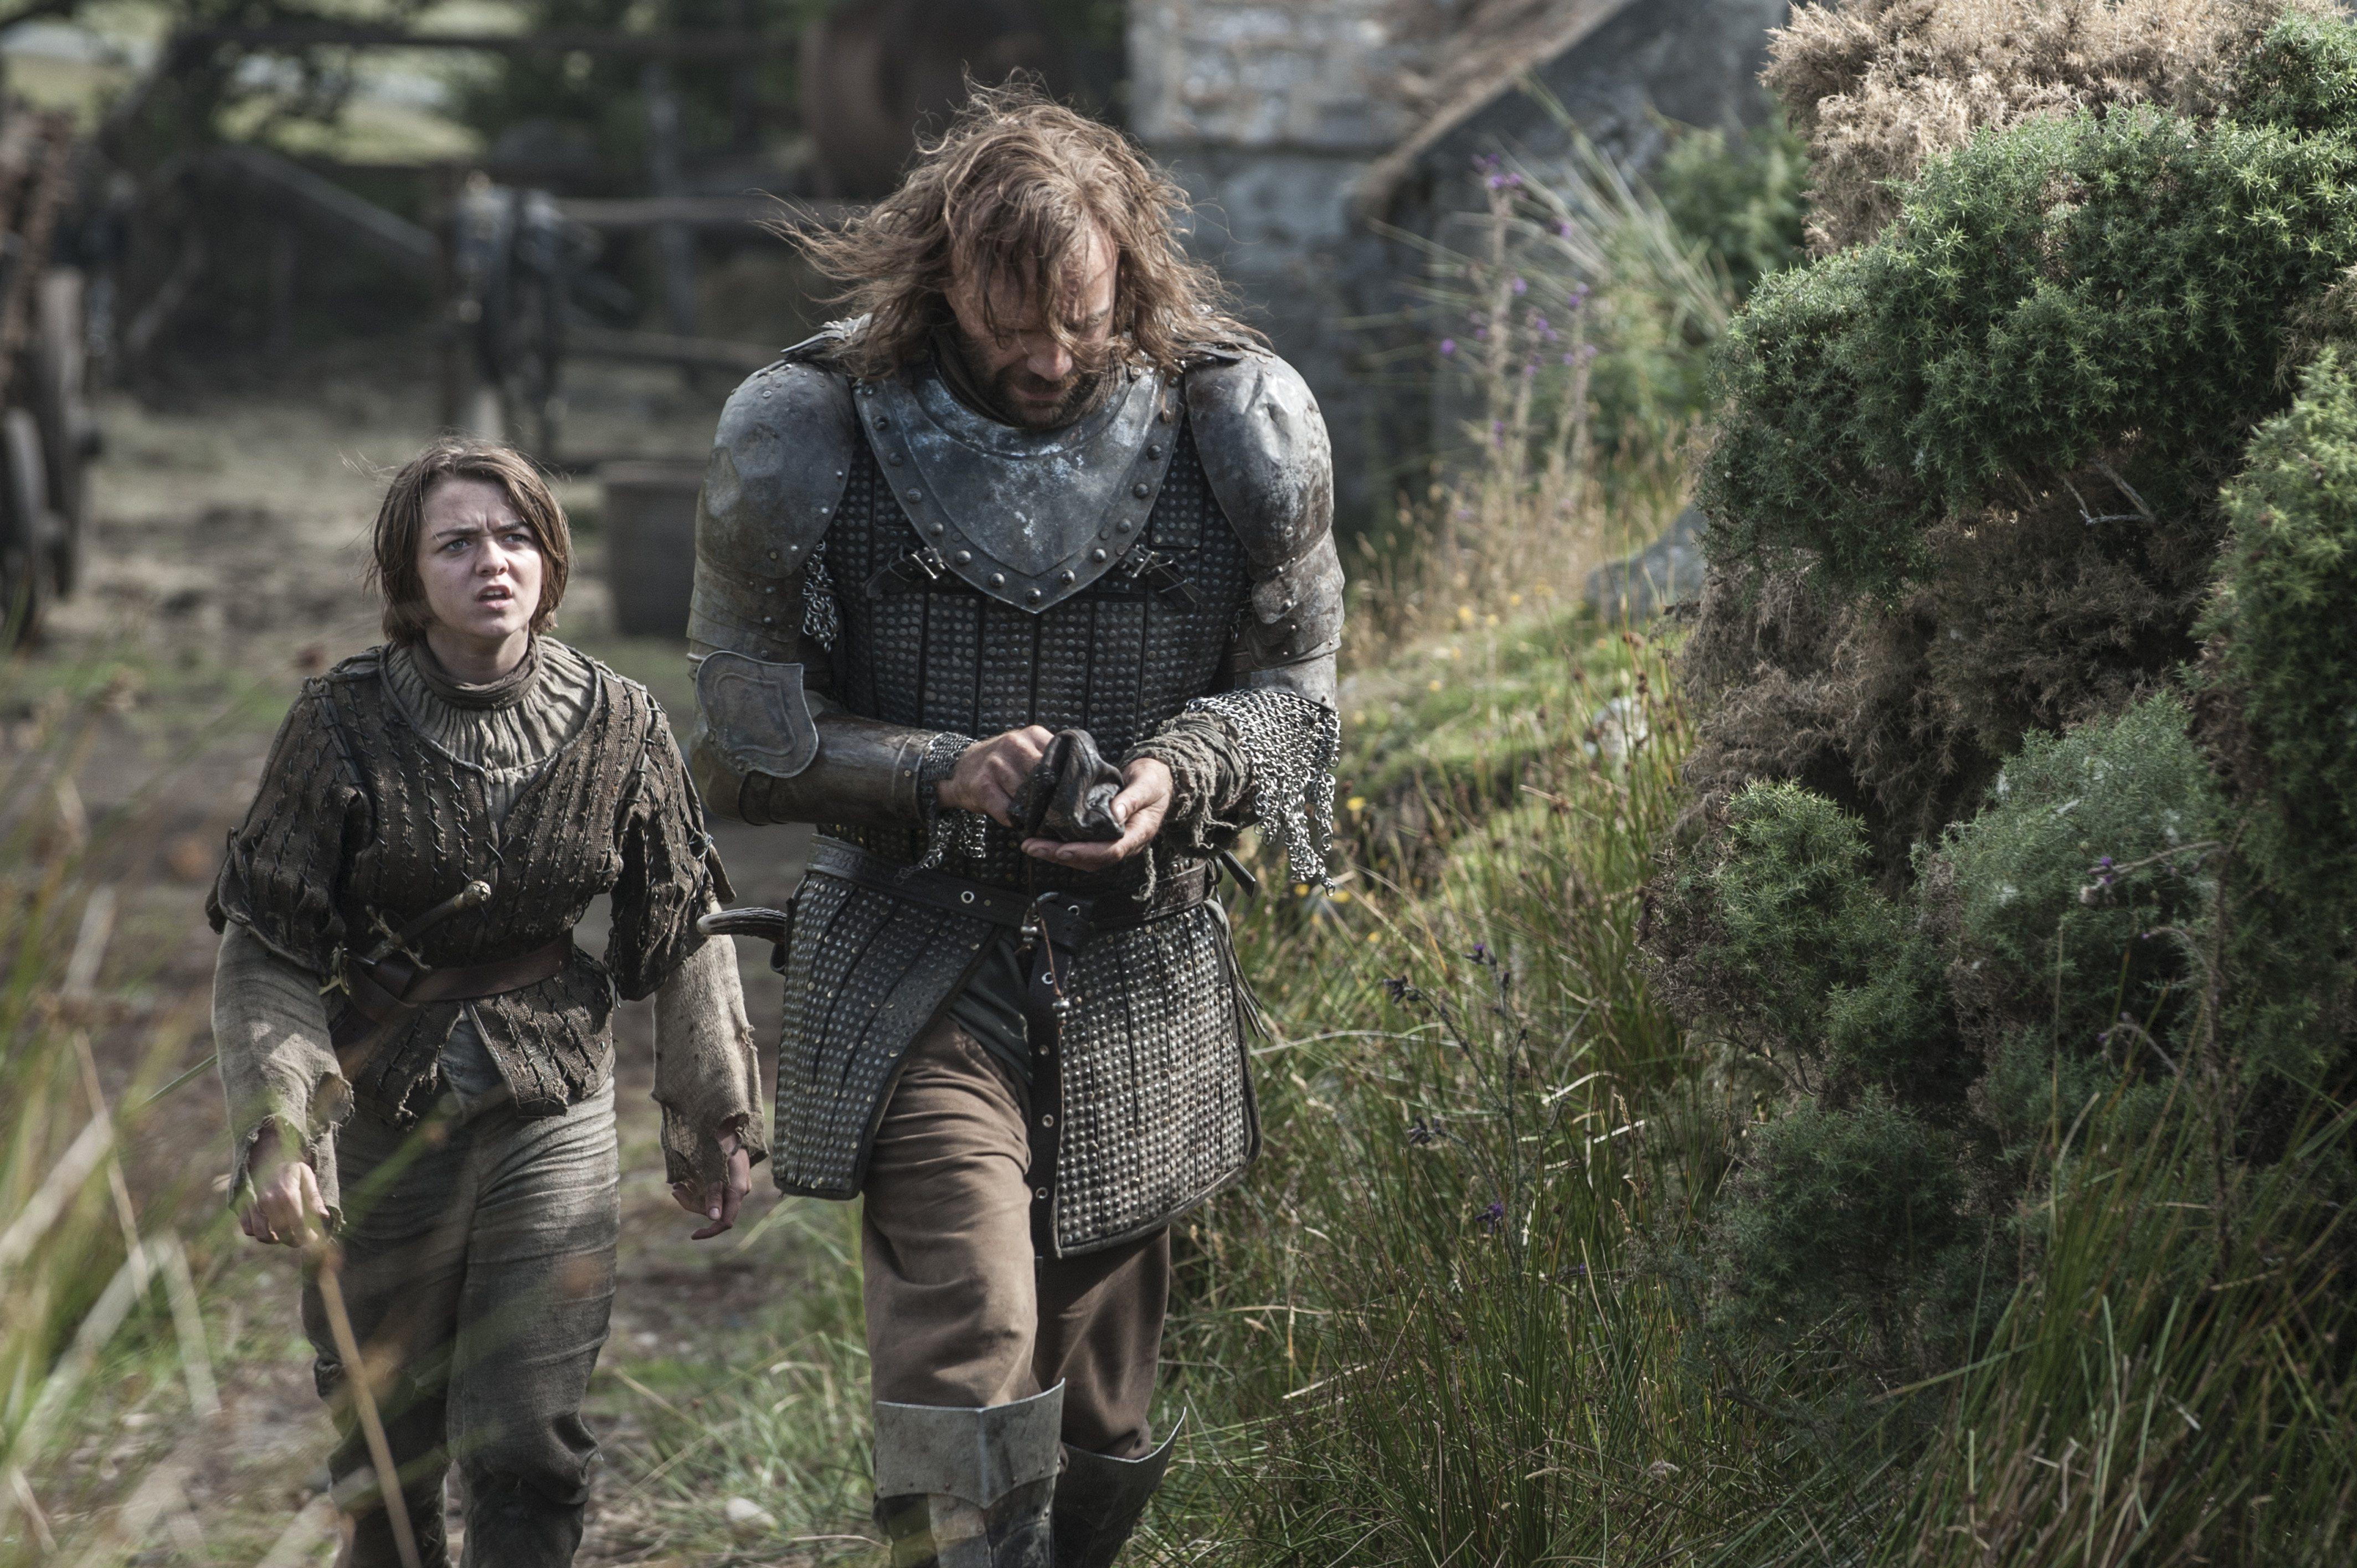 Arya Stark Wallpaper Hd - Game Of Thrones Season 4 Episode 3 , HD Wallpaper & Backgrounds